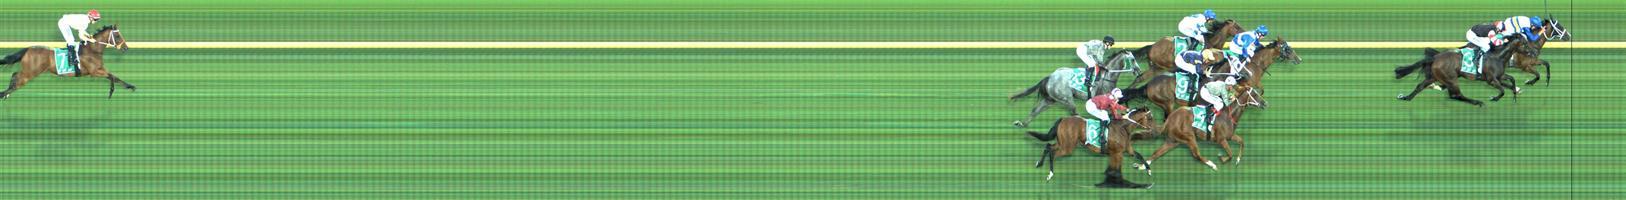 Cranbourne Race 4 No.6 Kilgour @ $11 - watch price   Result : Non Qualifier - Unplaced at SP $14.00